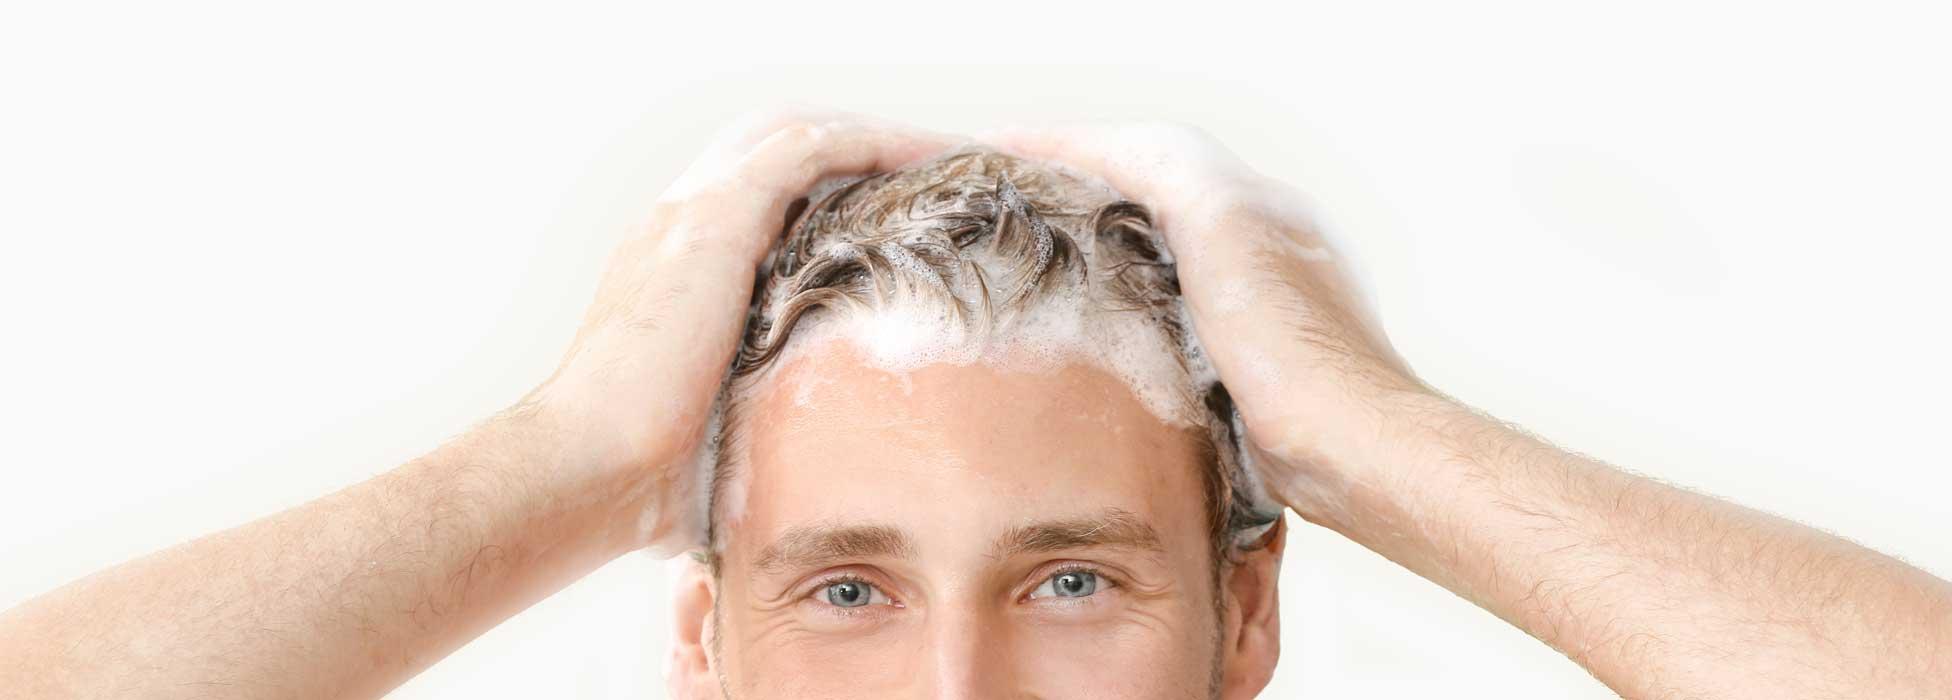 Man Shampoo Hair - Anti Dandruff supplied by barber